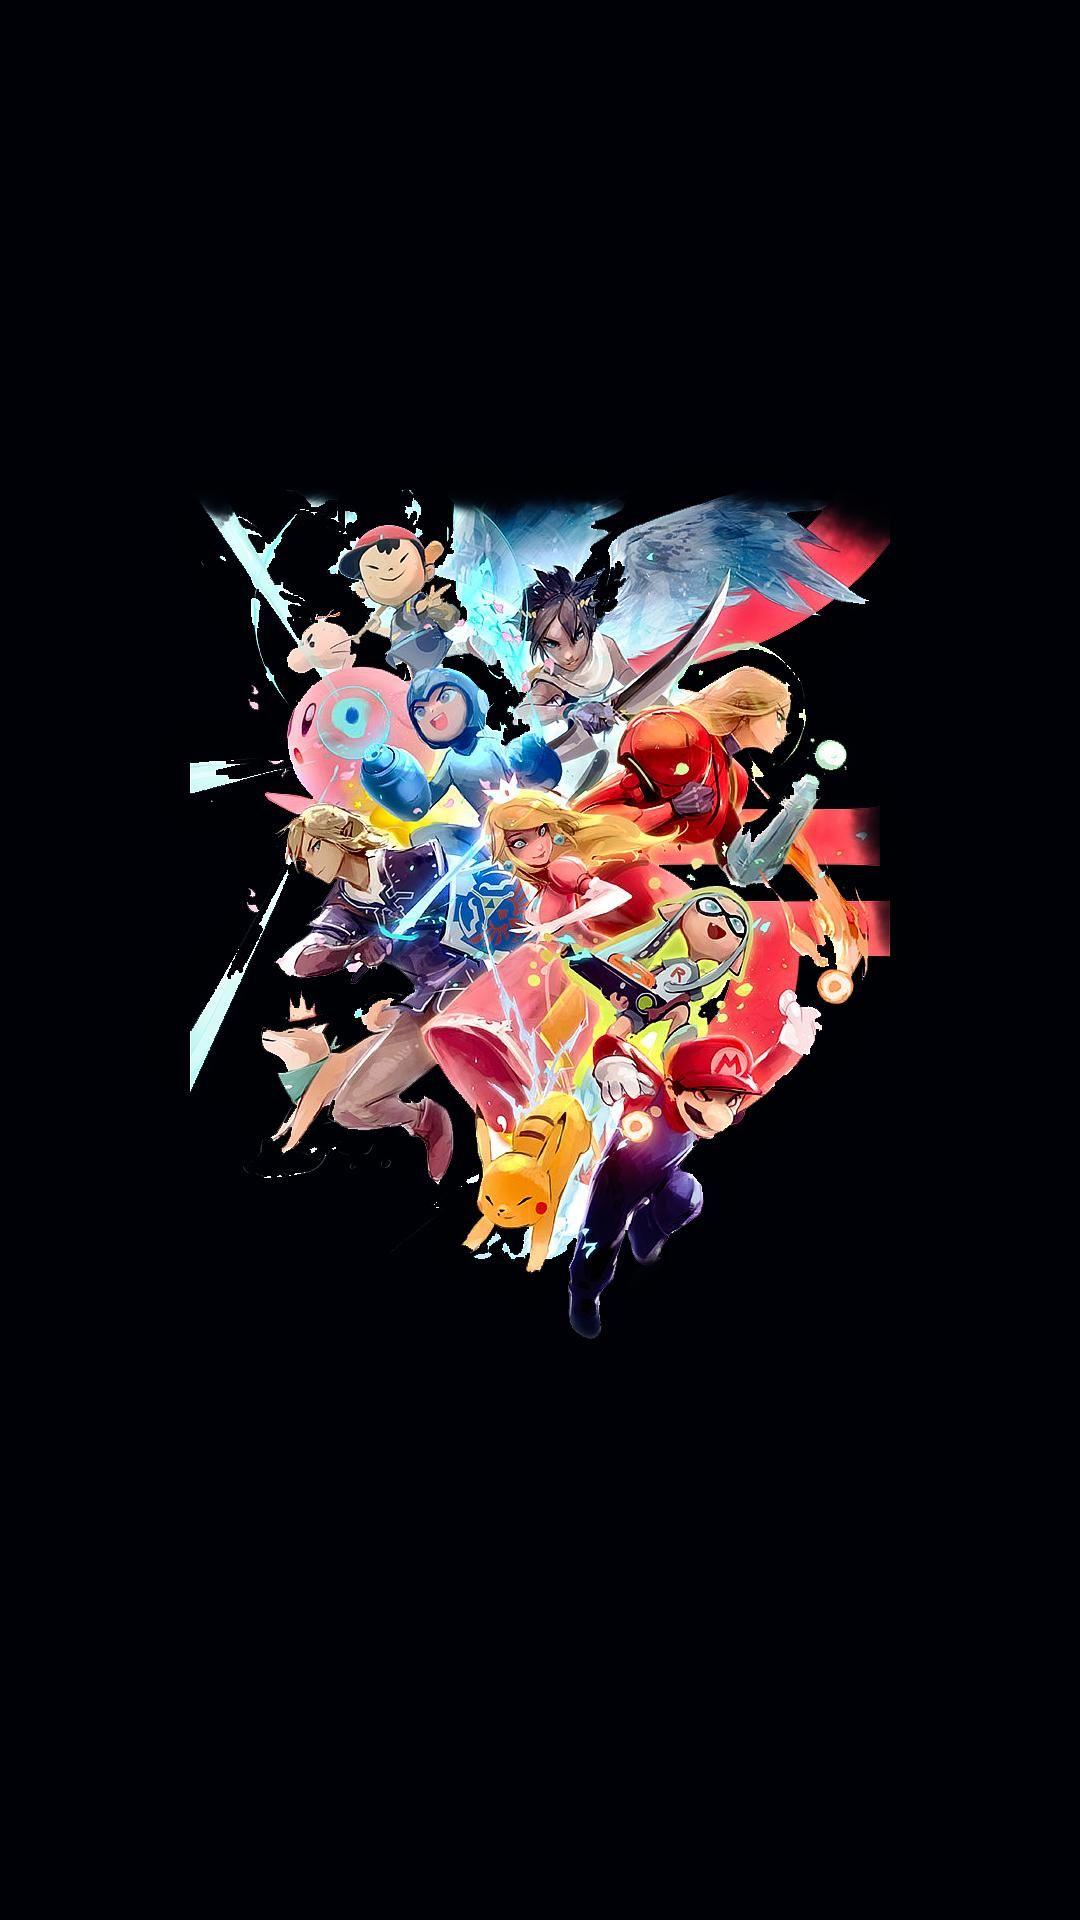 Smash Bros Android phone wallpaper, Phone wallpaper